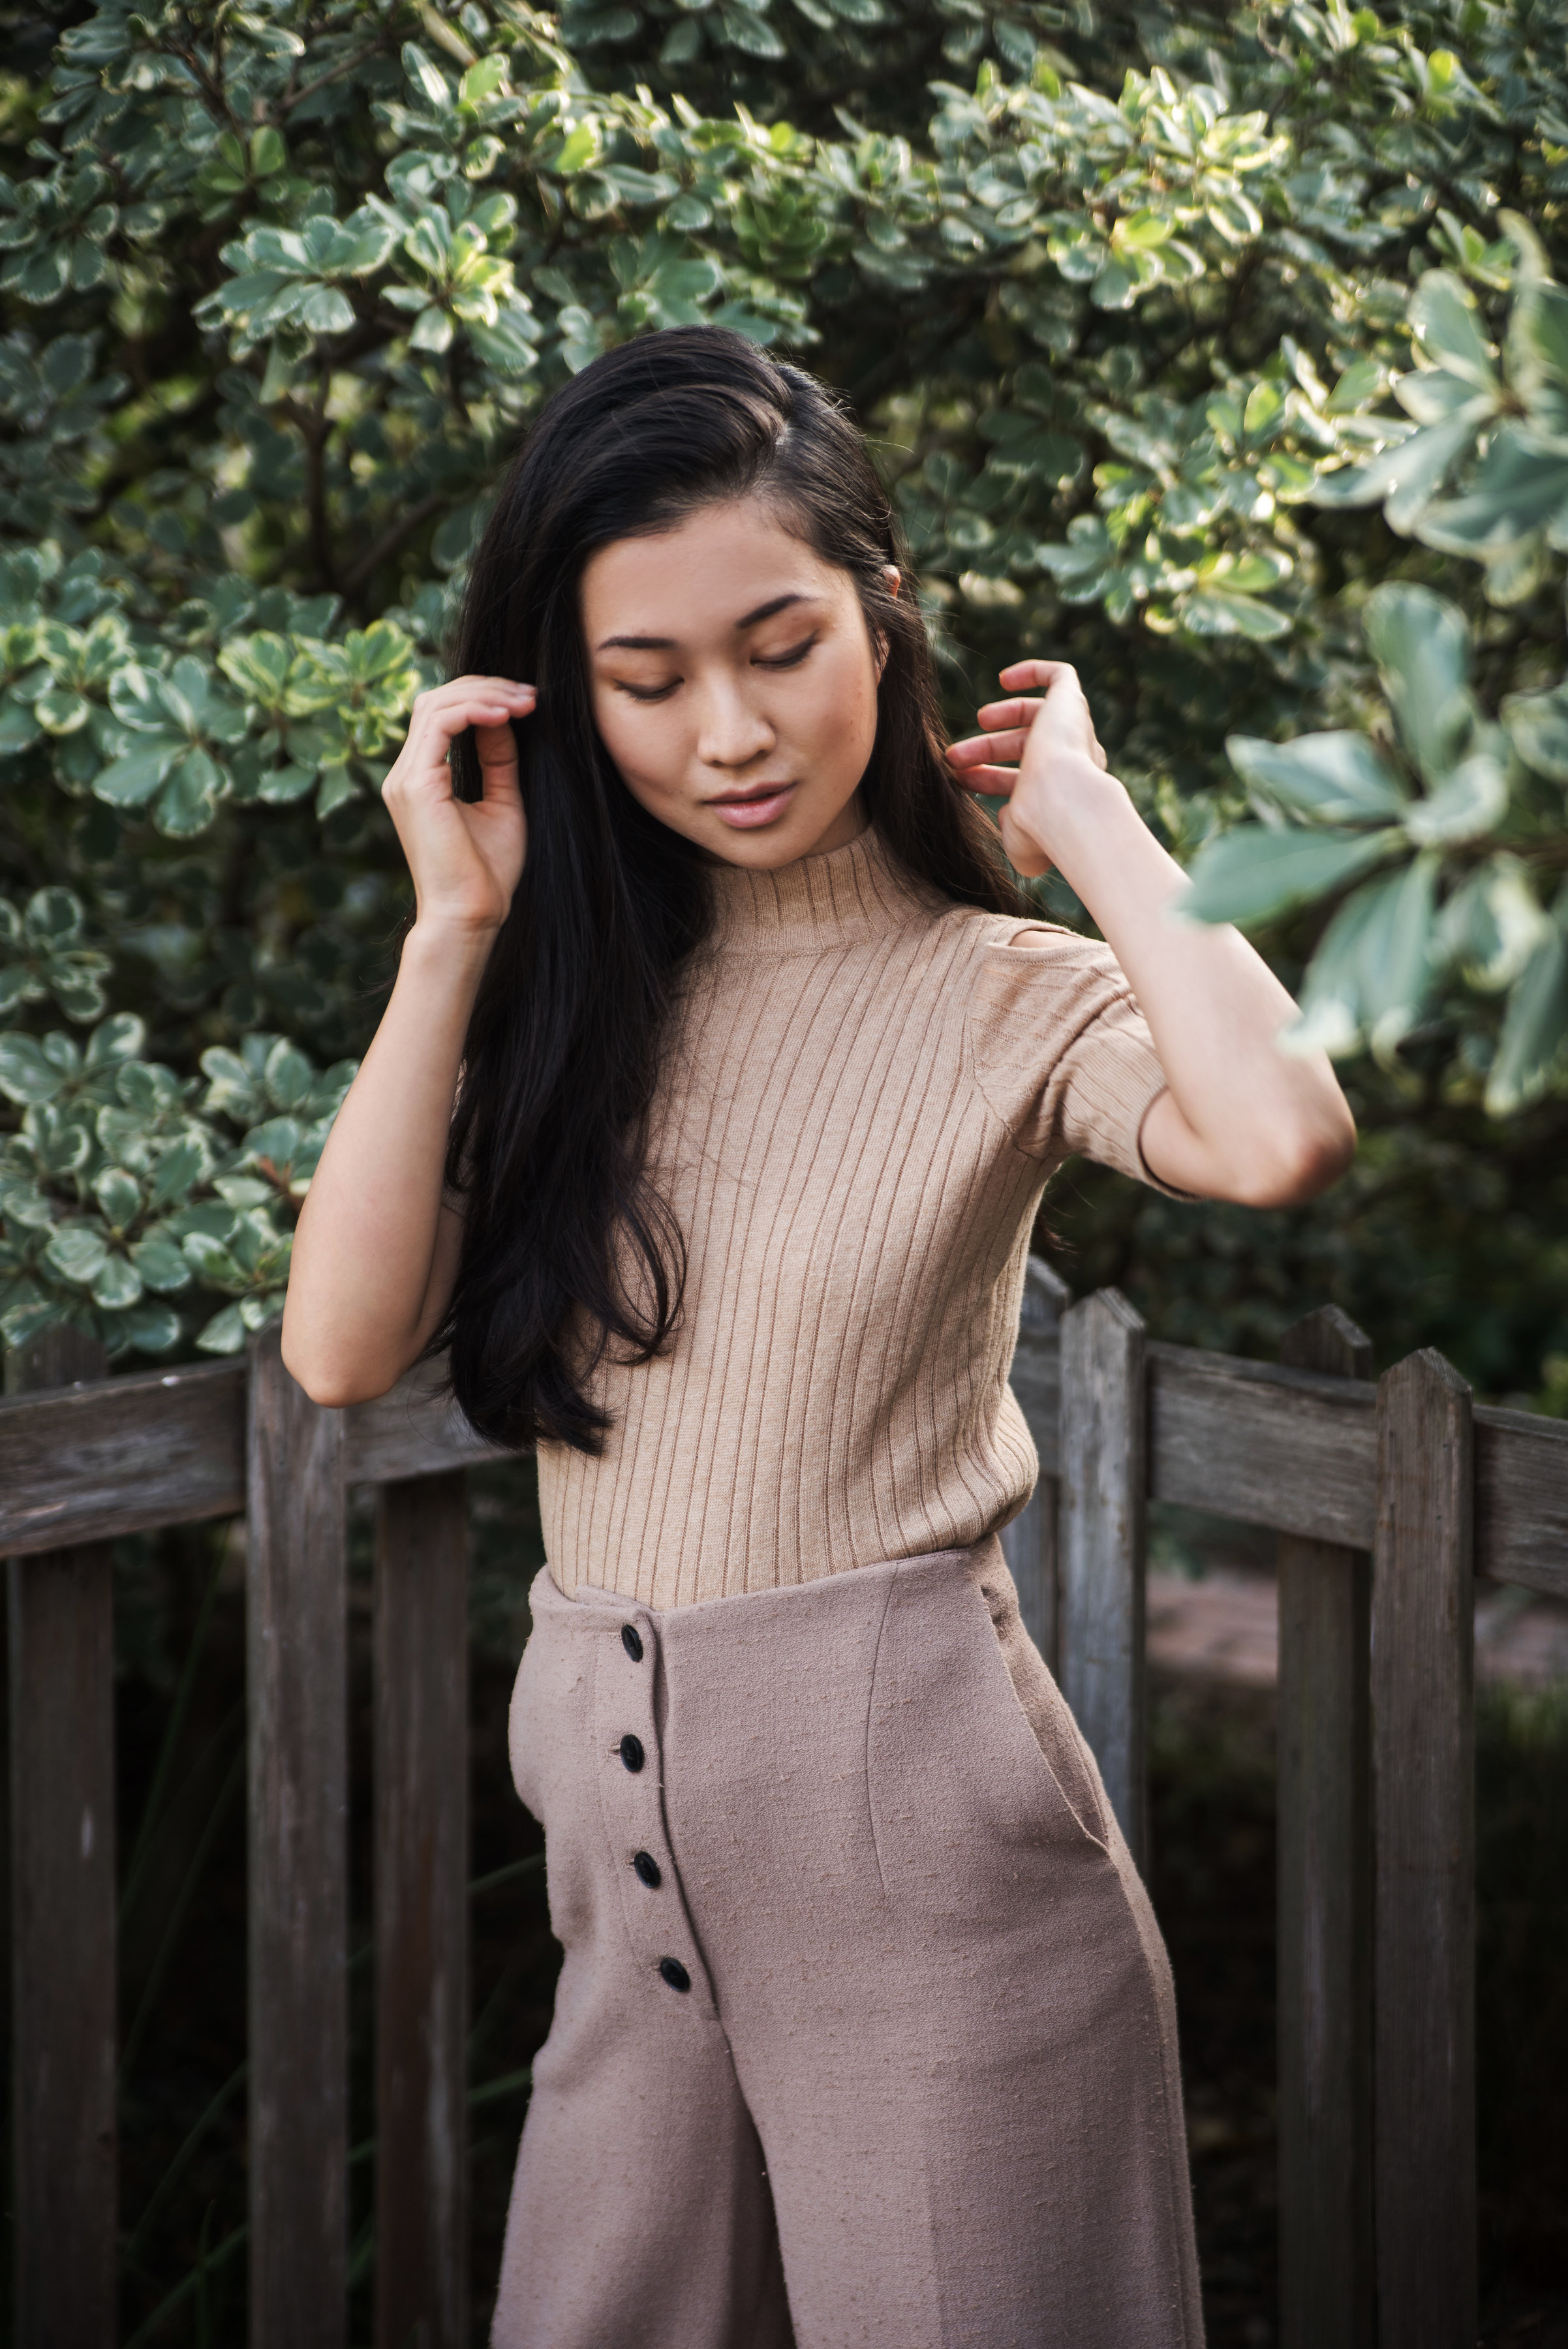 Sustainable Fashion Brands | Eco Fashion Blogger Kaméa Chayne